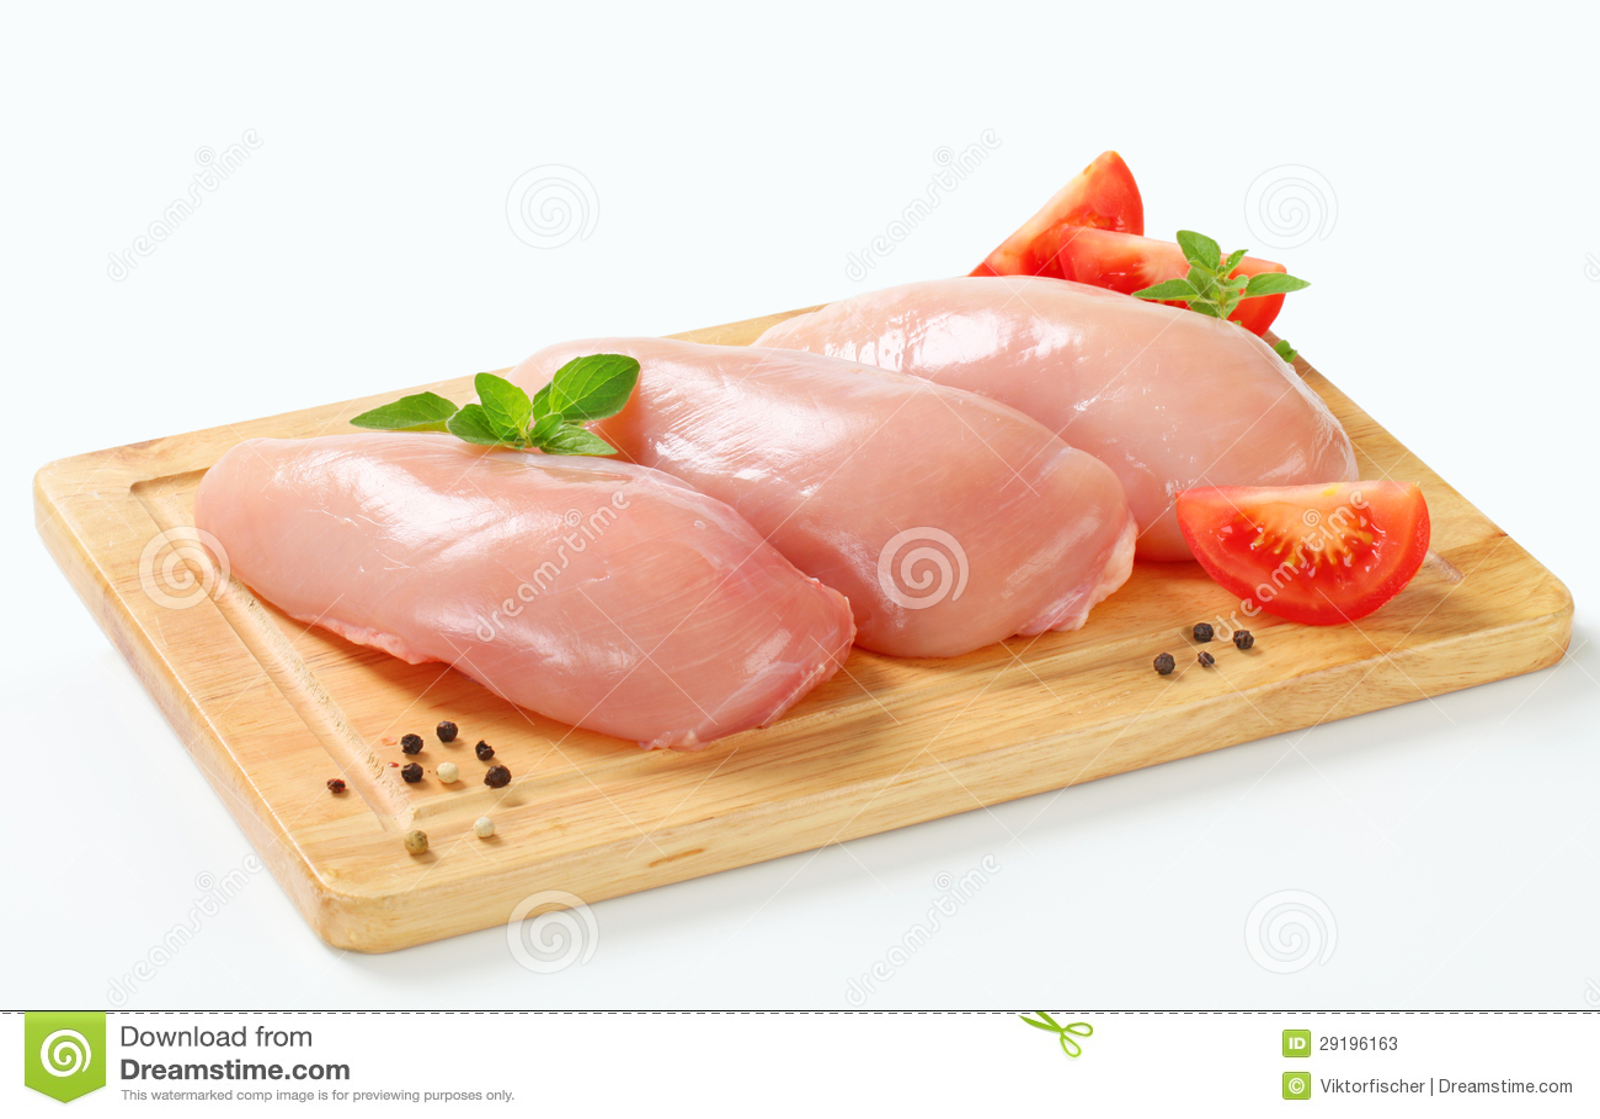 Chicken breast recipes BBC Good Food